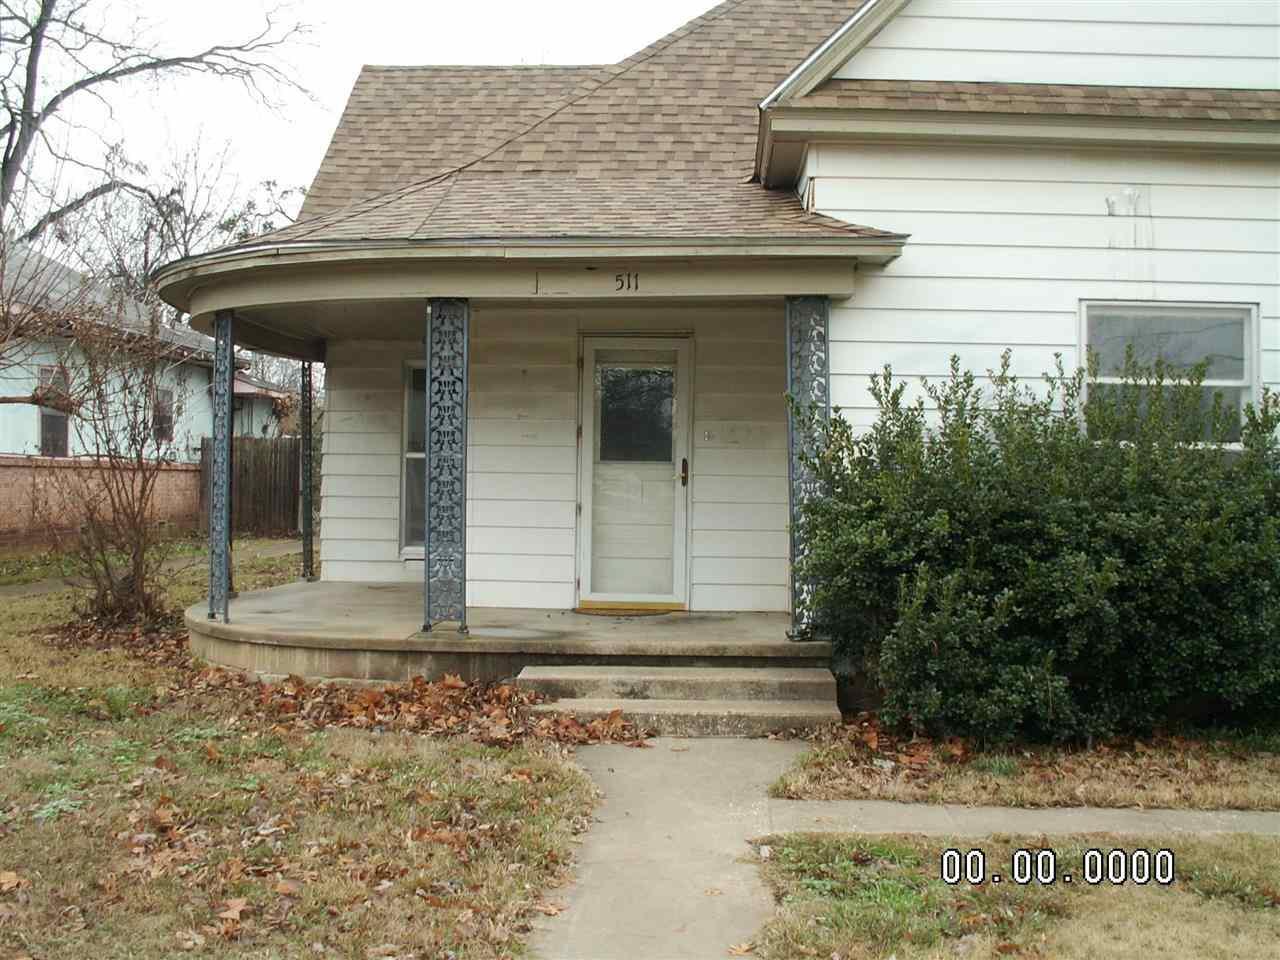 511 N 7th Ave, Durant, OK 74701